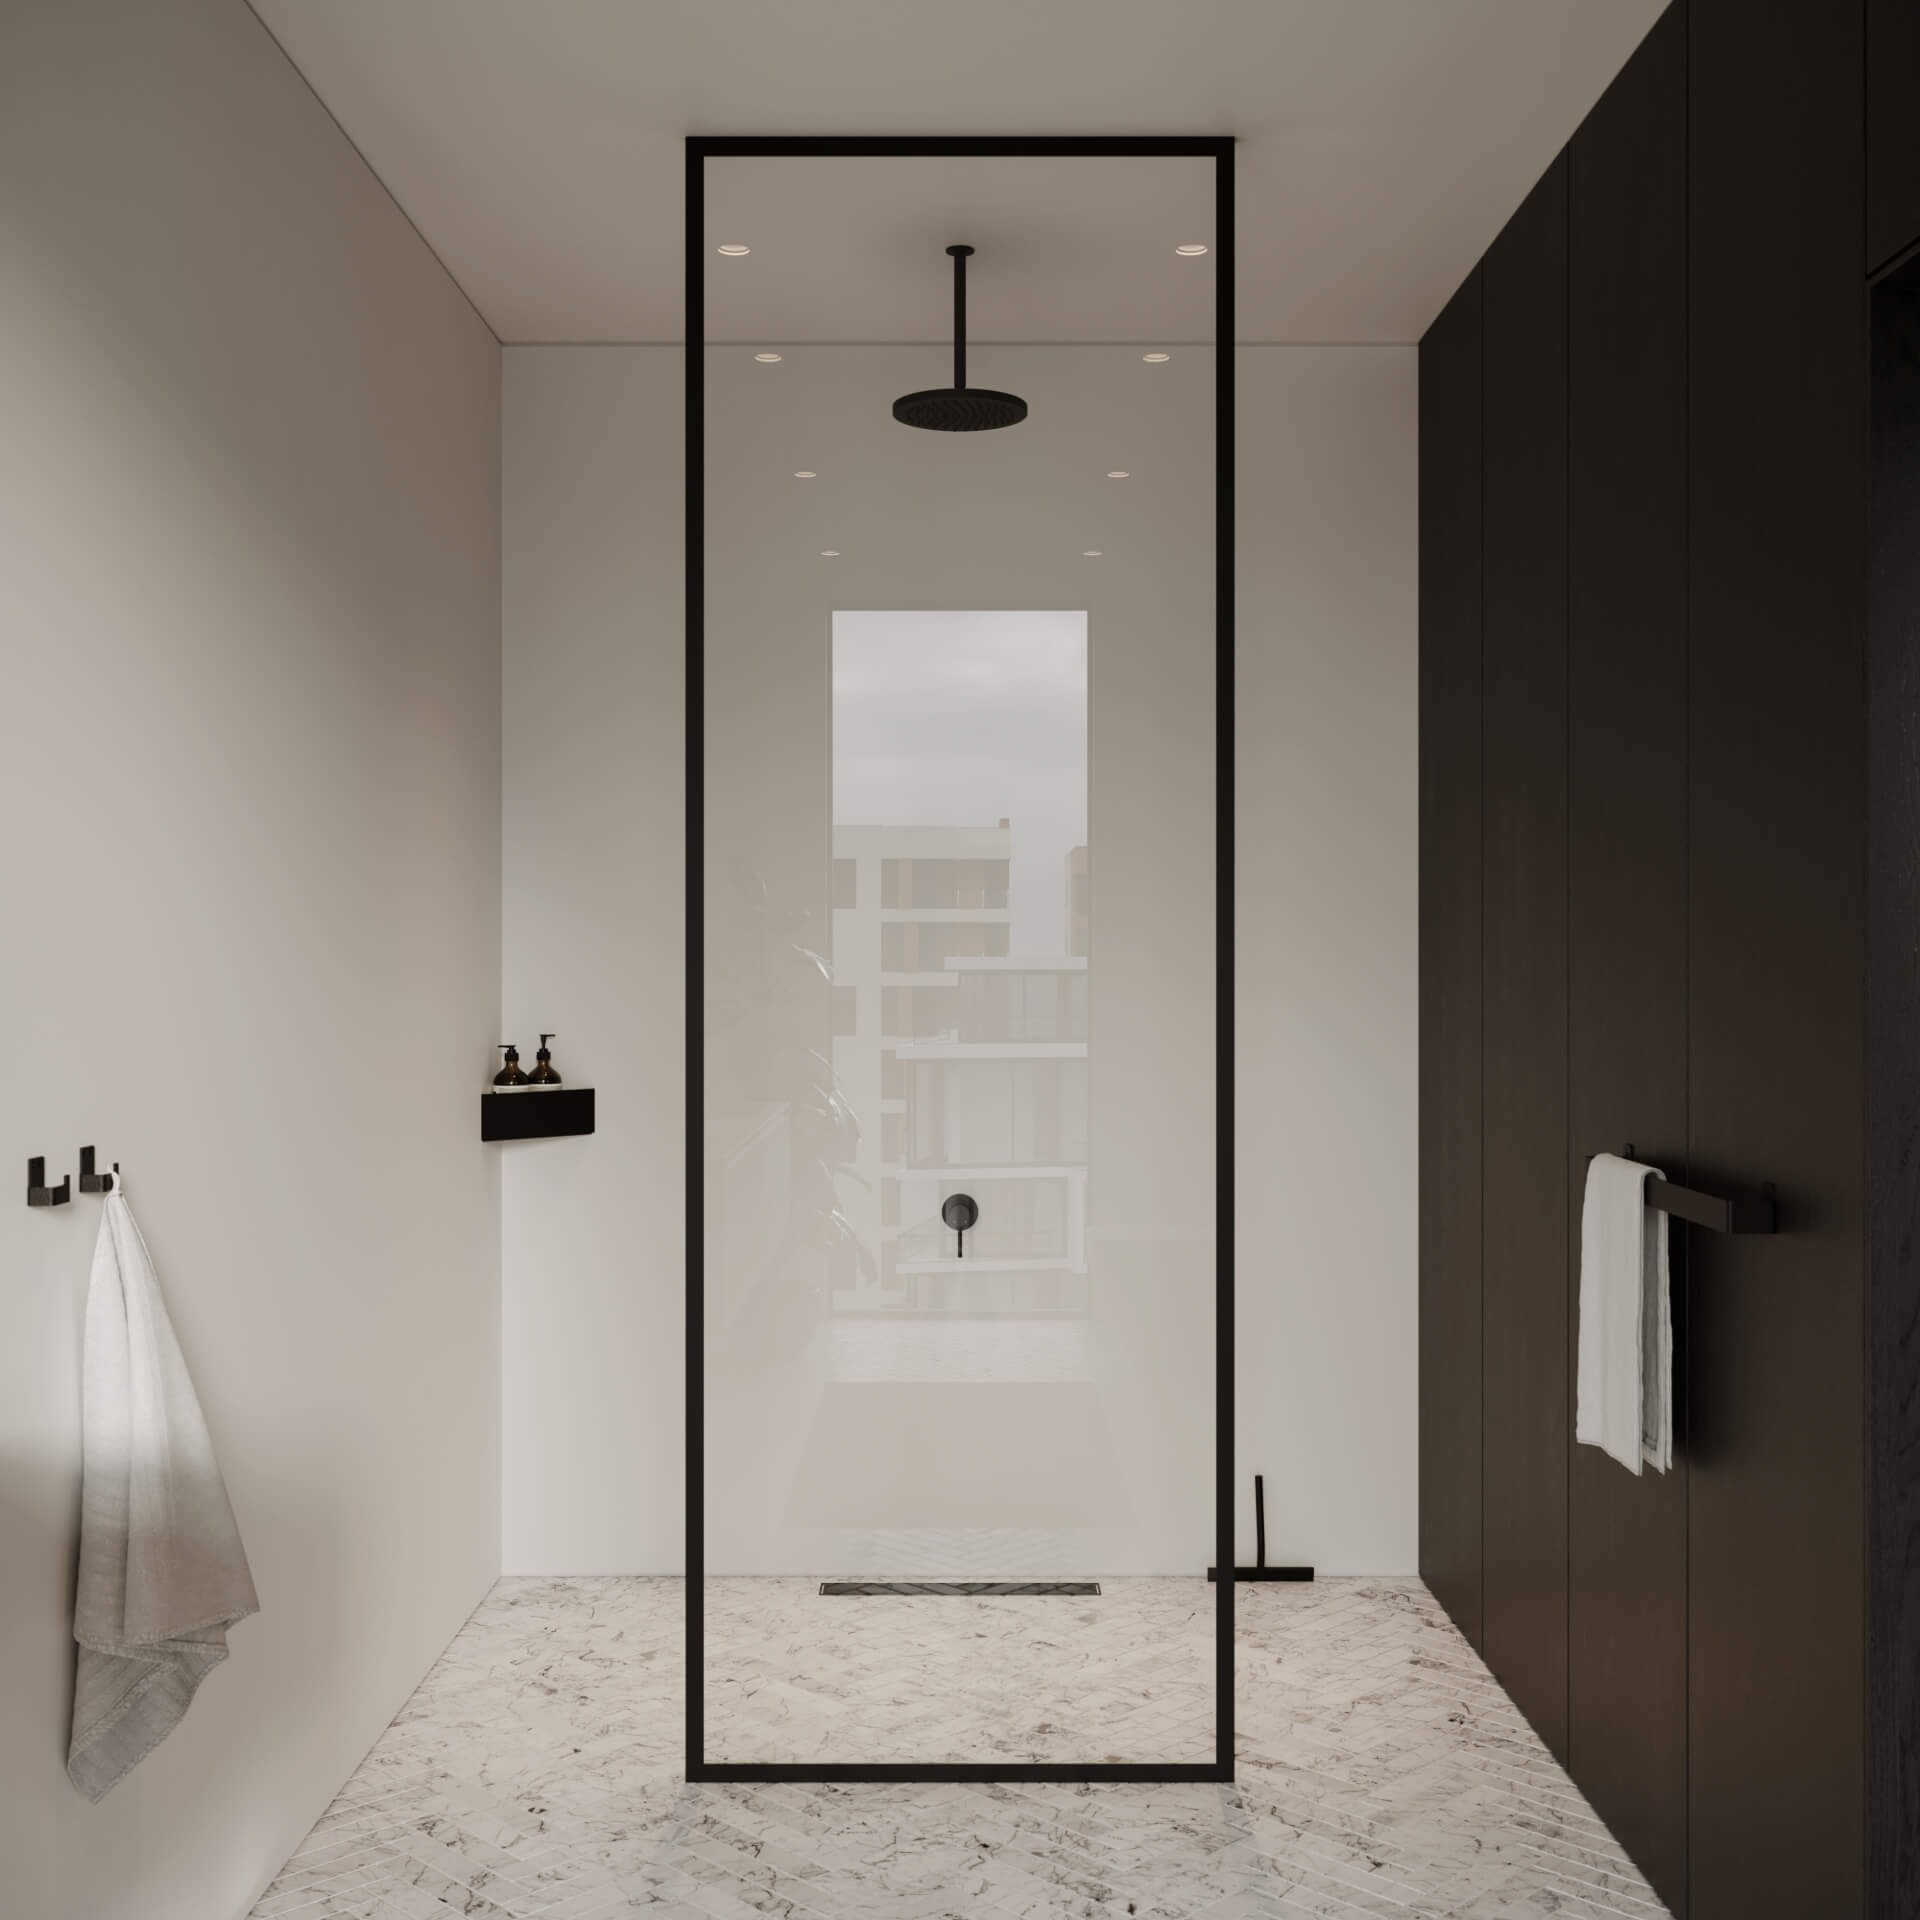 Nichba: Hyller og dorullholder i minimalistisk stil | Eitra Bad